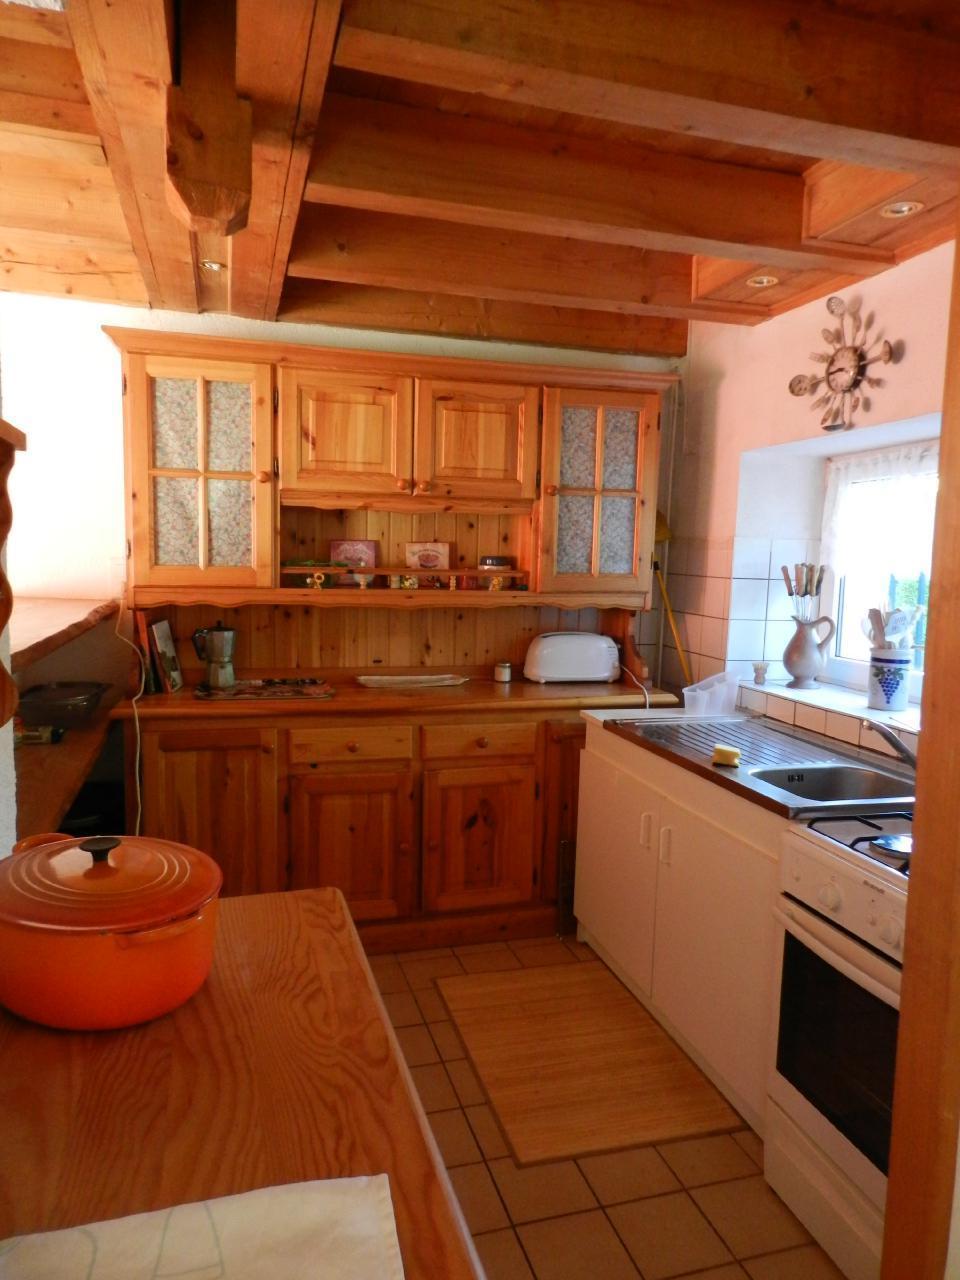 Ferienhaus Steinhäuschen Shila, im Naturparc der Vogesen,  mit Saunahaus (1717460), La Rosière, Haute-Saône, Franche-Comté, Frankreich, Bild 12